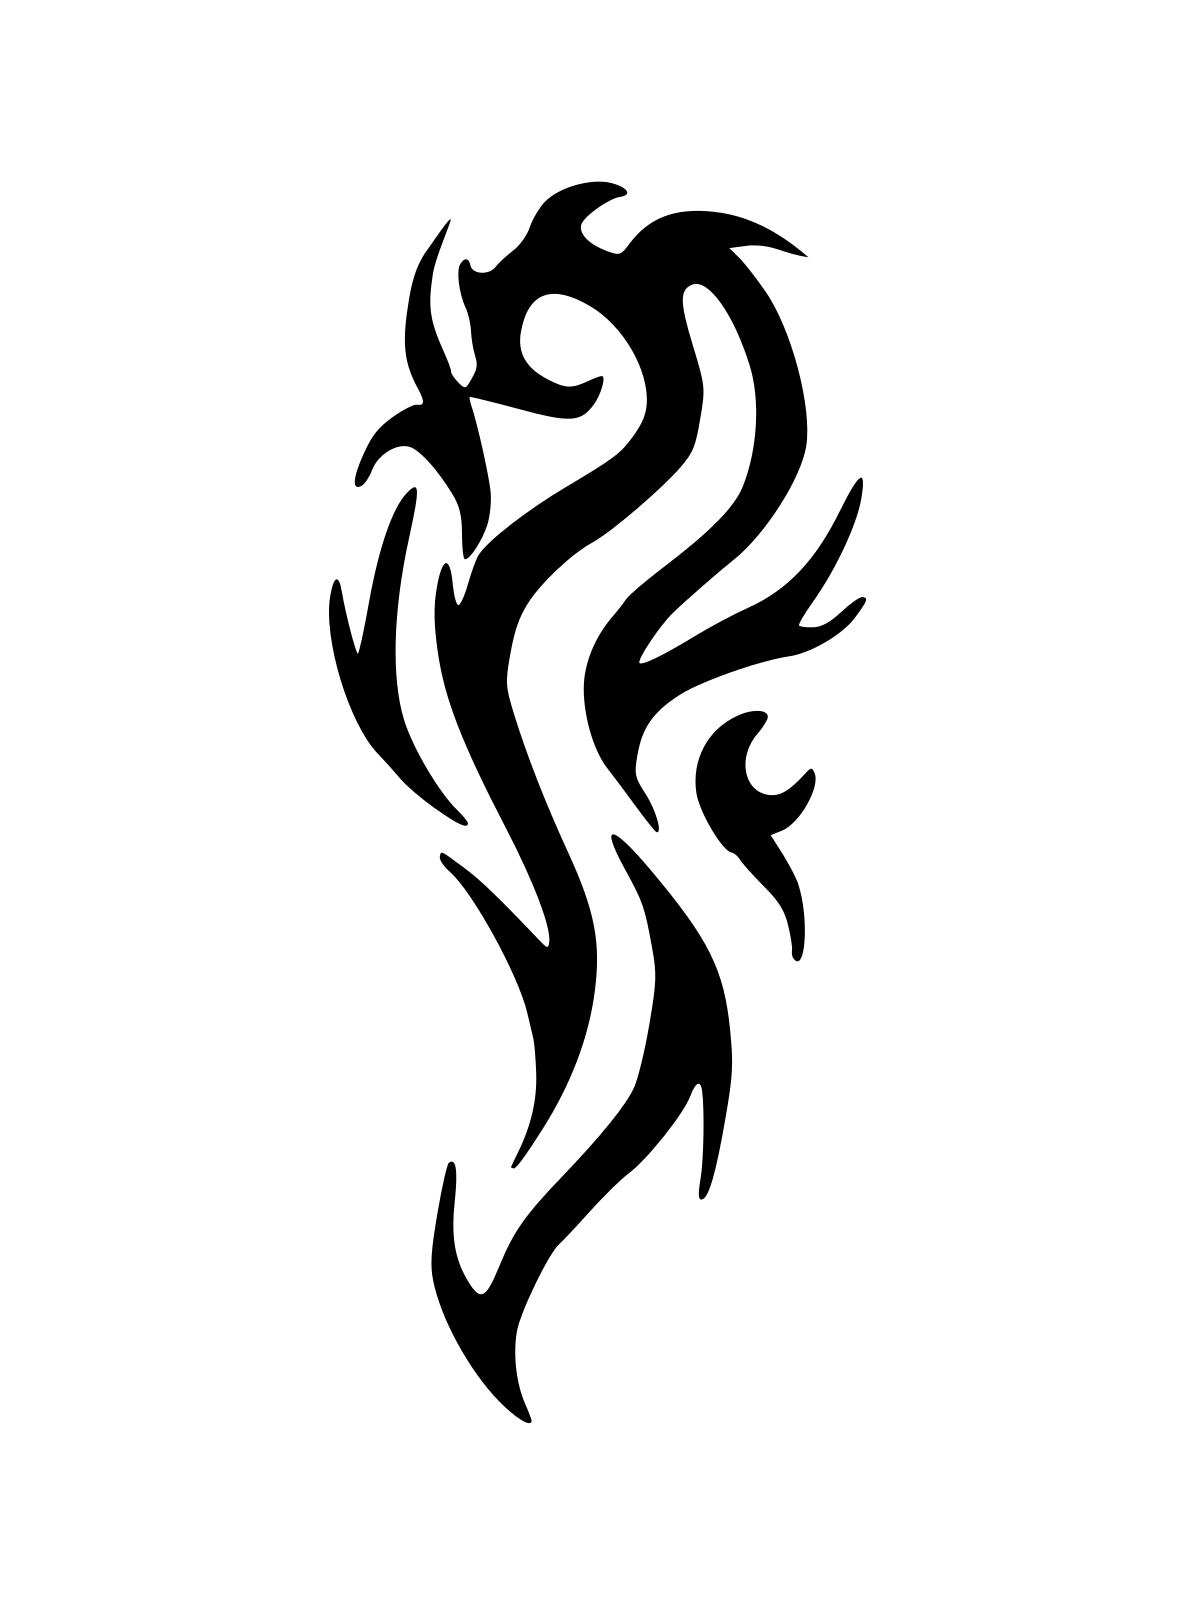 20 Tribal Tattoo Design for Inspiration.